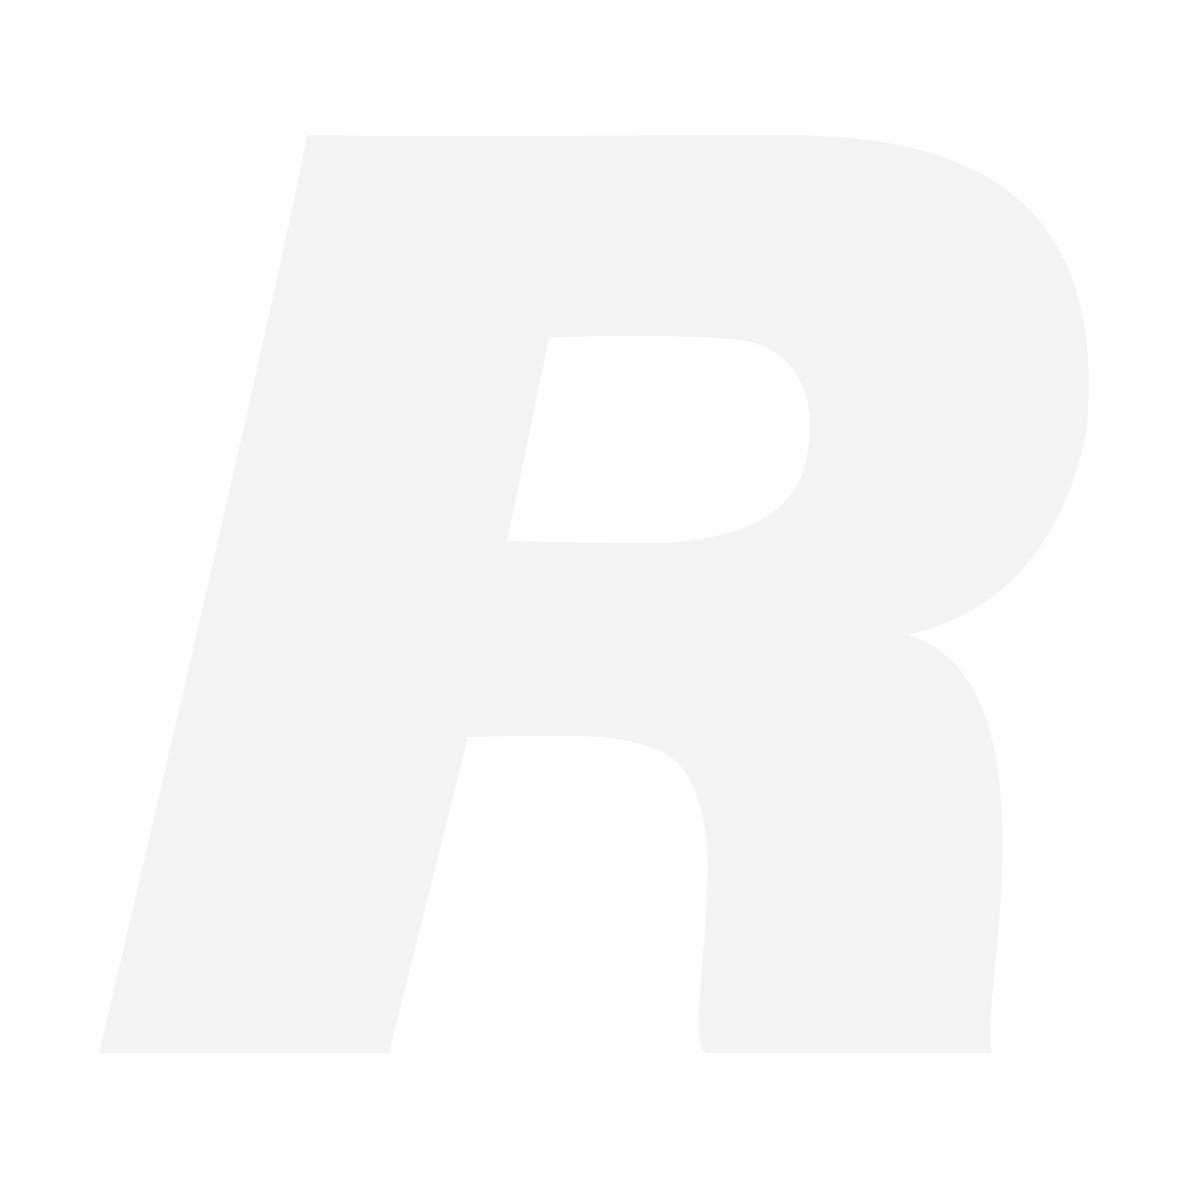 MANFROTTO R515.06 VARAOSA